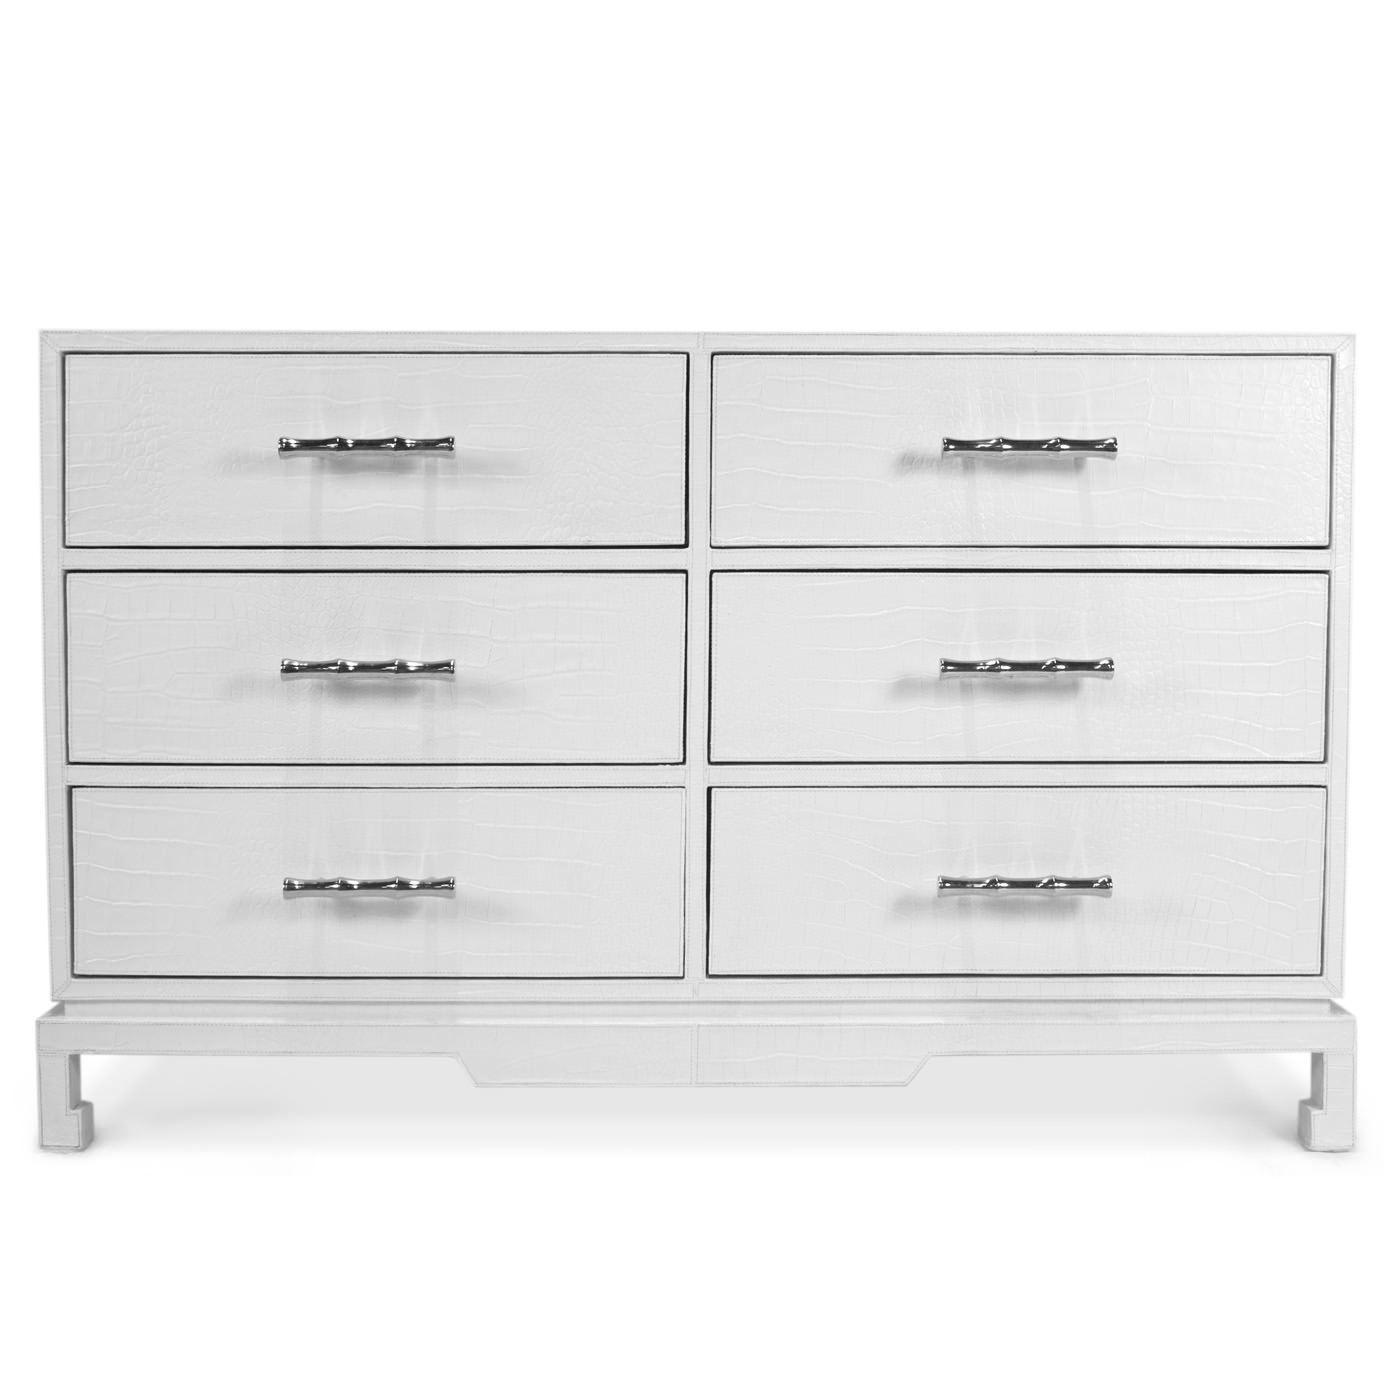 Modern Mid Century Dressers Cabinets And Shelving Preston Six Drawer Console Modern Dresser Dresser Drawers 6 Drawer Dresser [ 1400 x 1400 Pixel ]